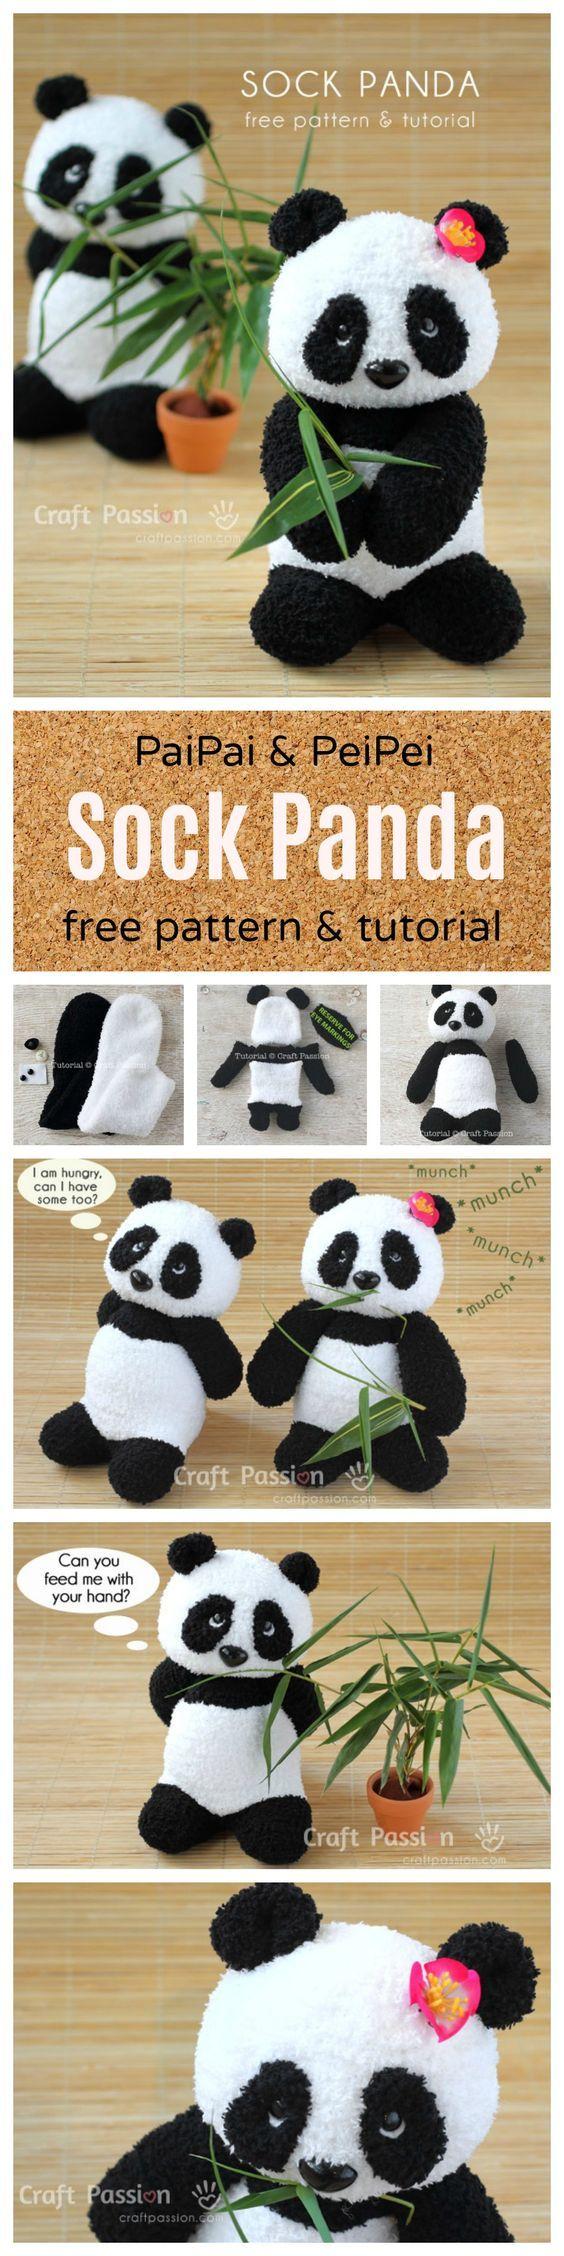 Free Sewing Pattern: PaiPai & PeiPei Sock Panda